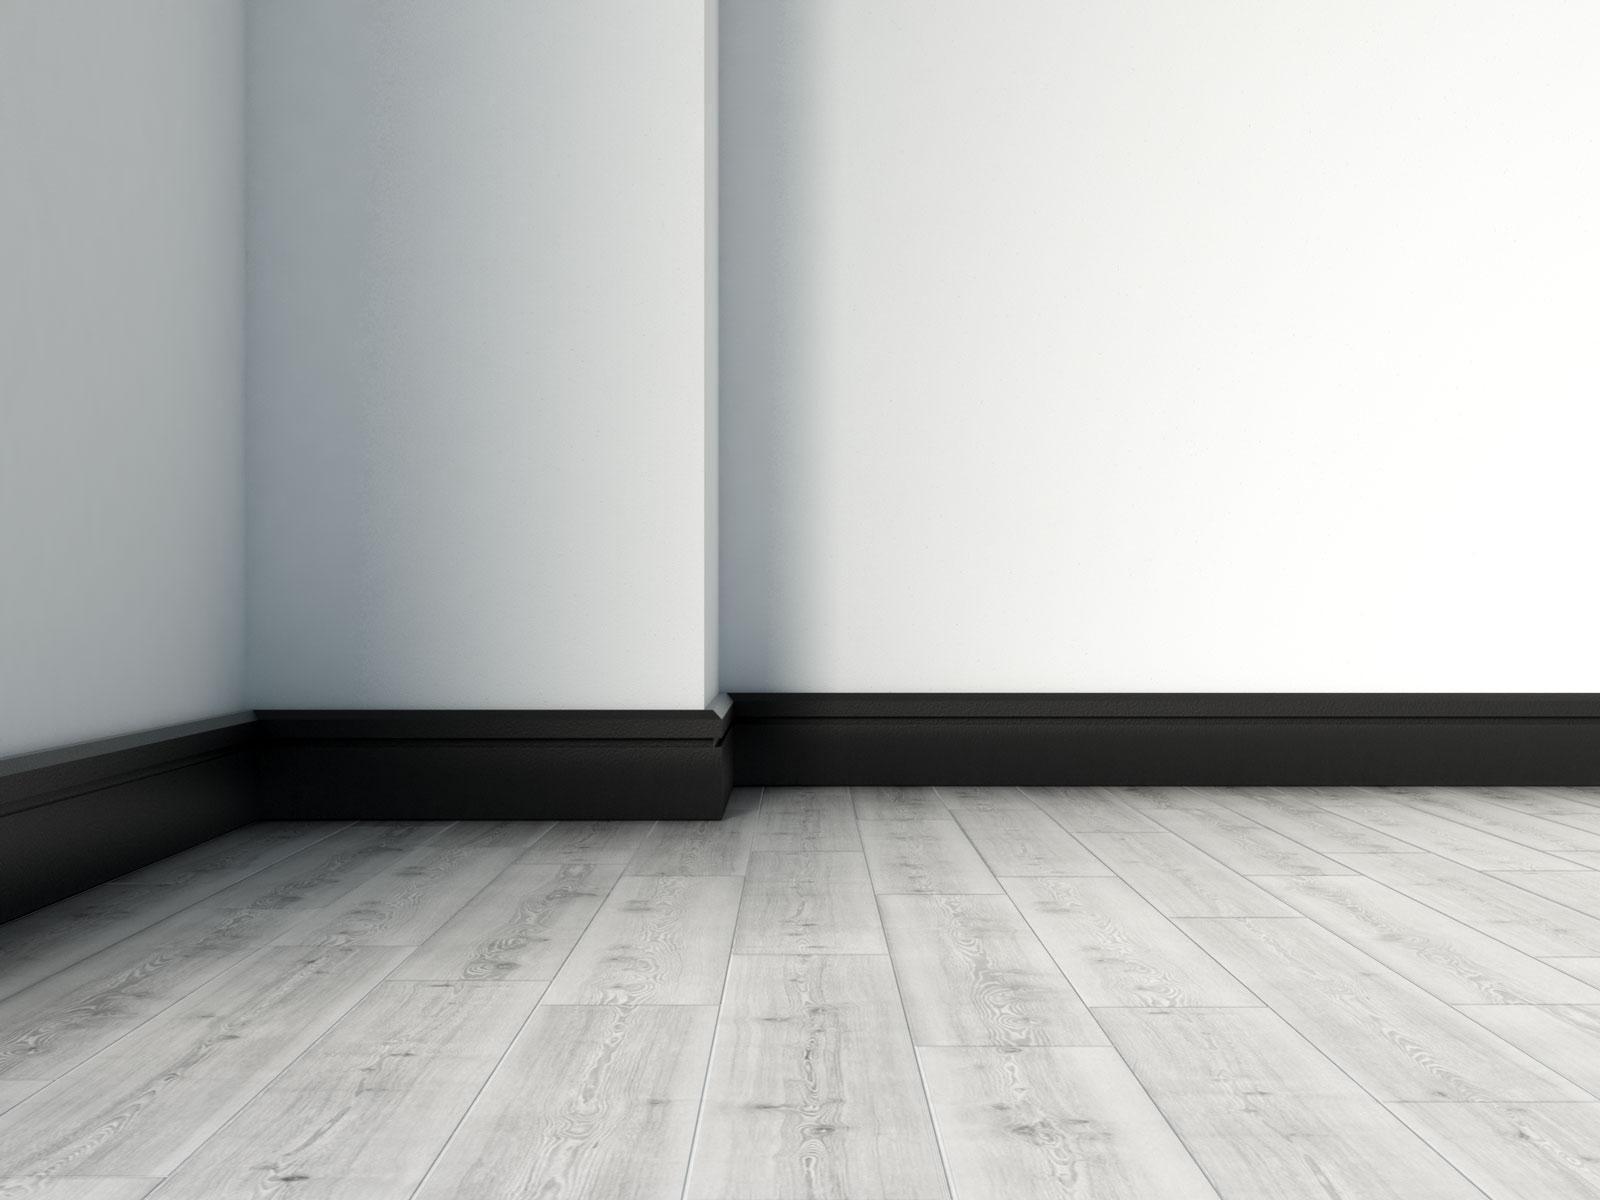 Black baseboard with gray hardwood flooring